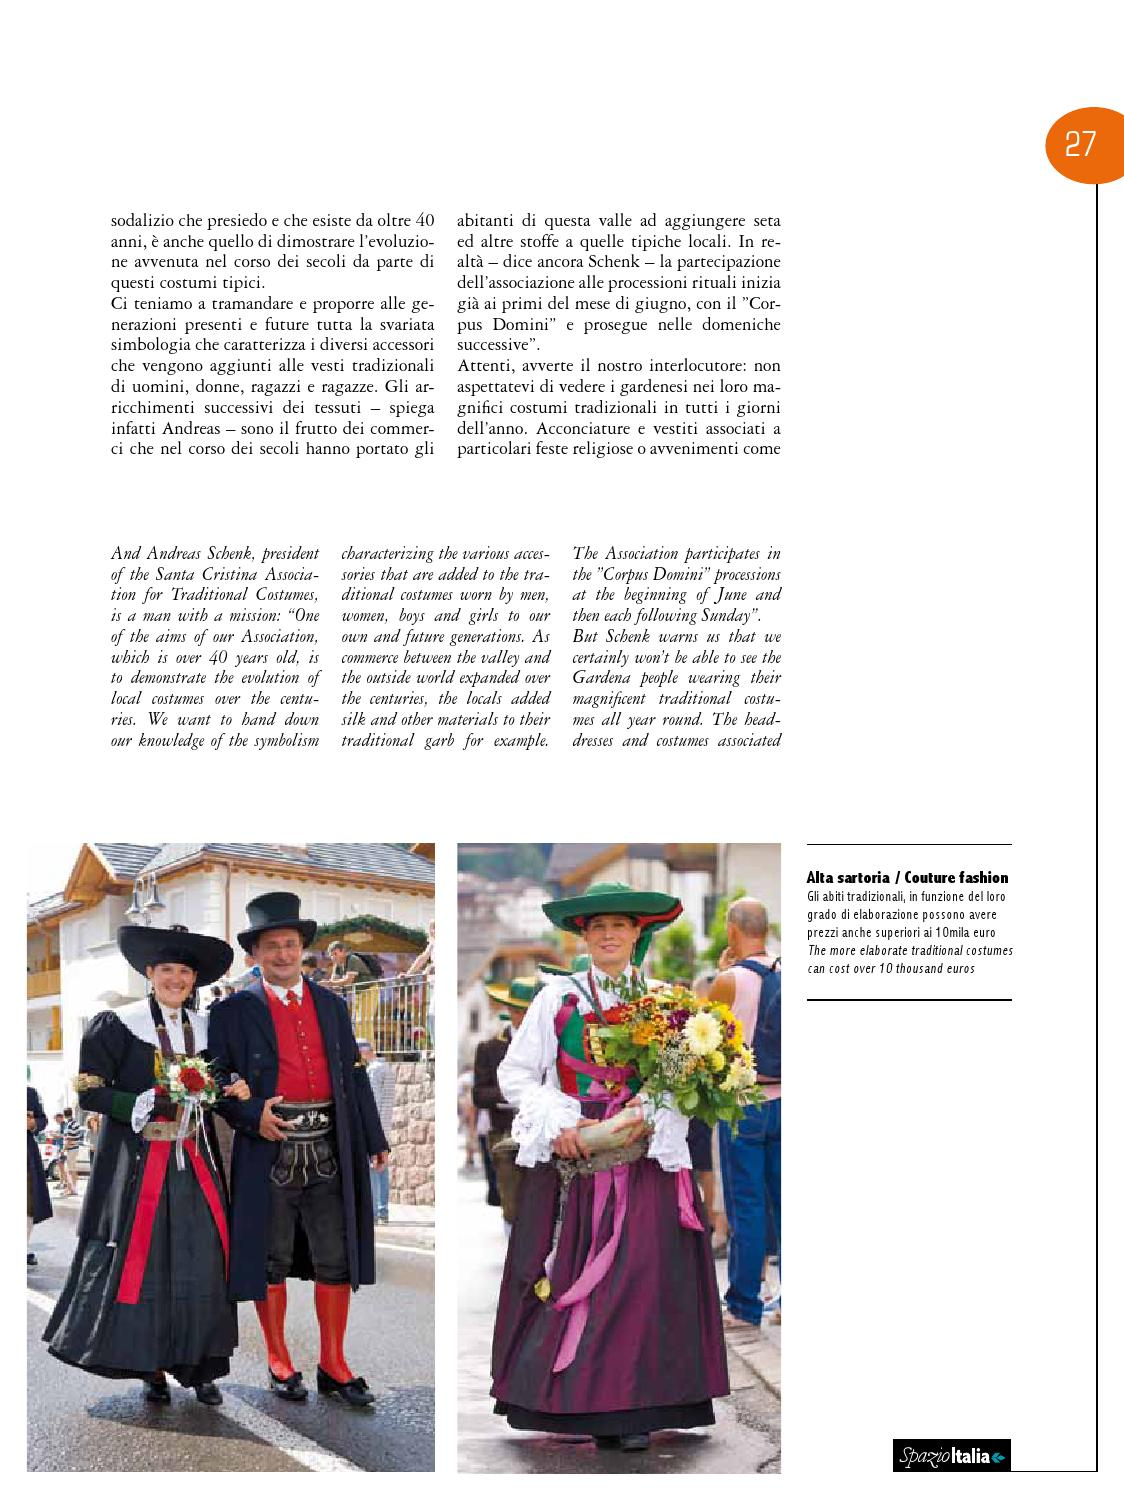 Spazio Italia Magazine no. 109 by AIR DOLOMITI - issuu